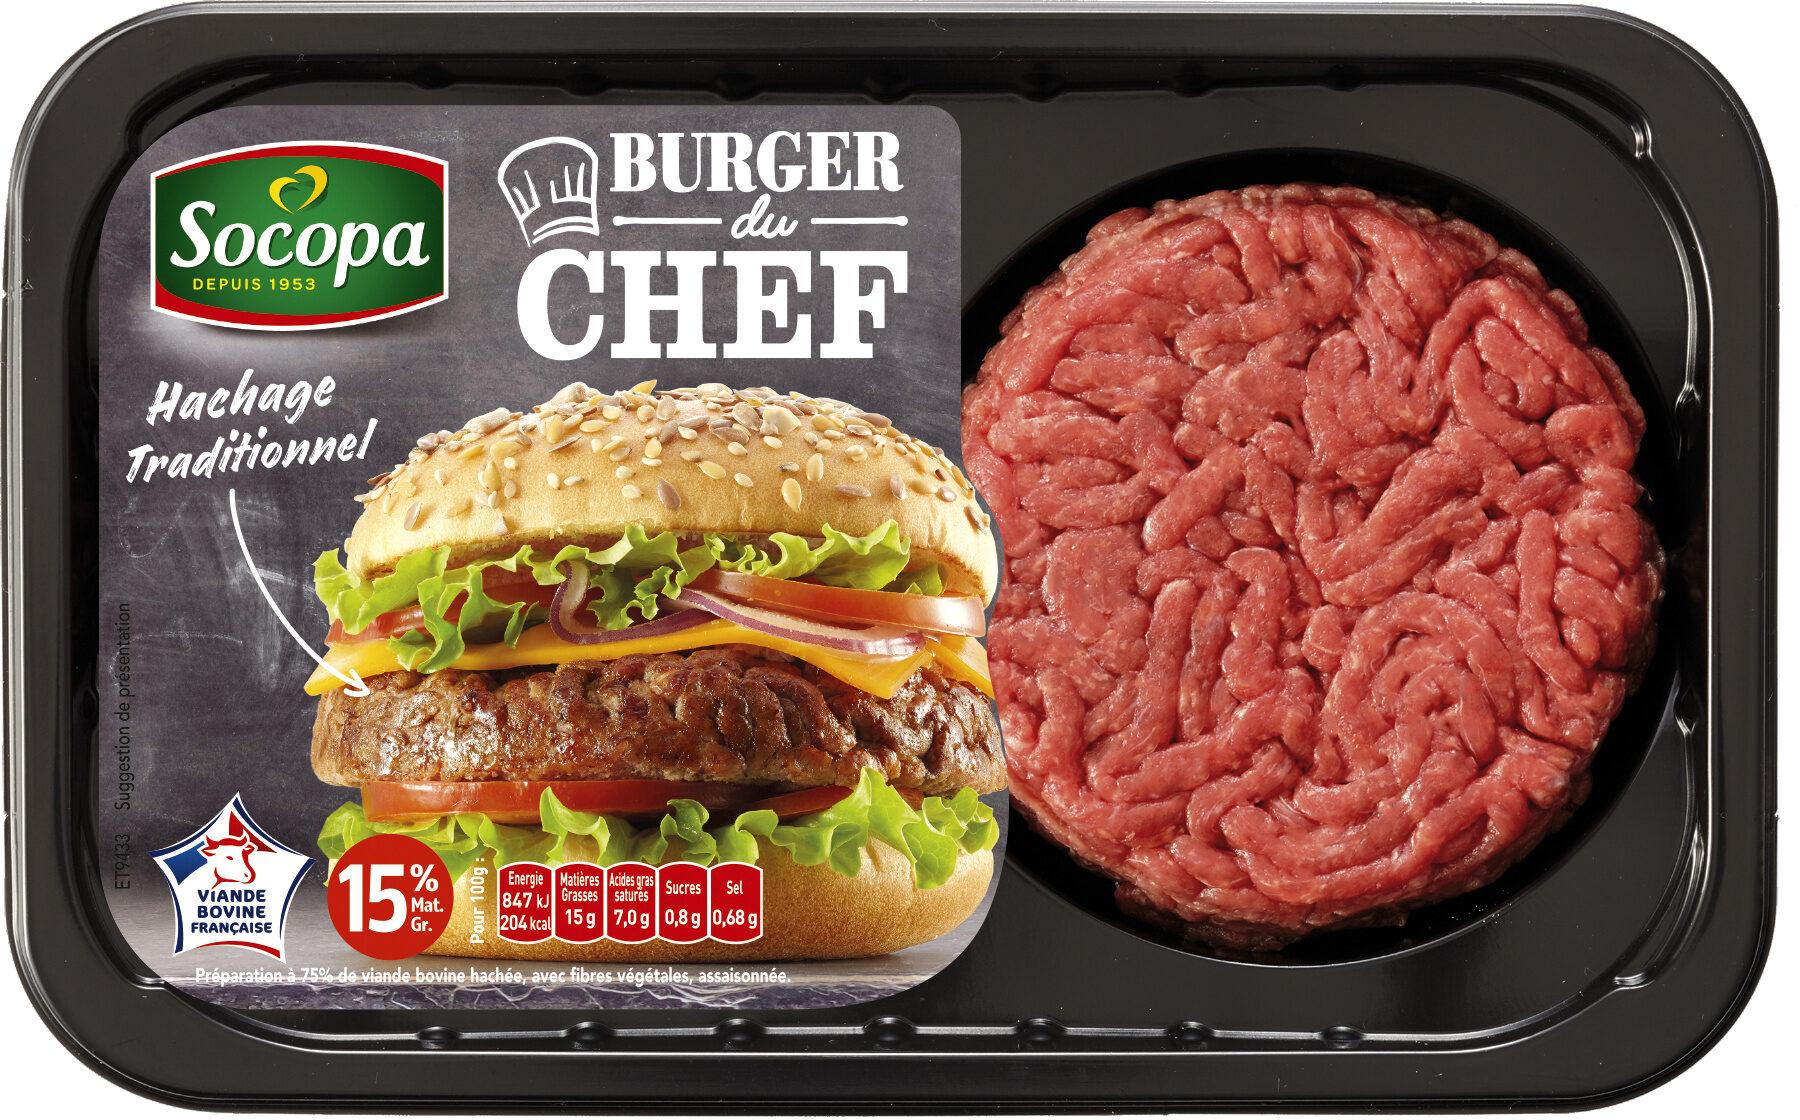 Burger du chef nature 15% Mat.gr - Product - fr